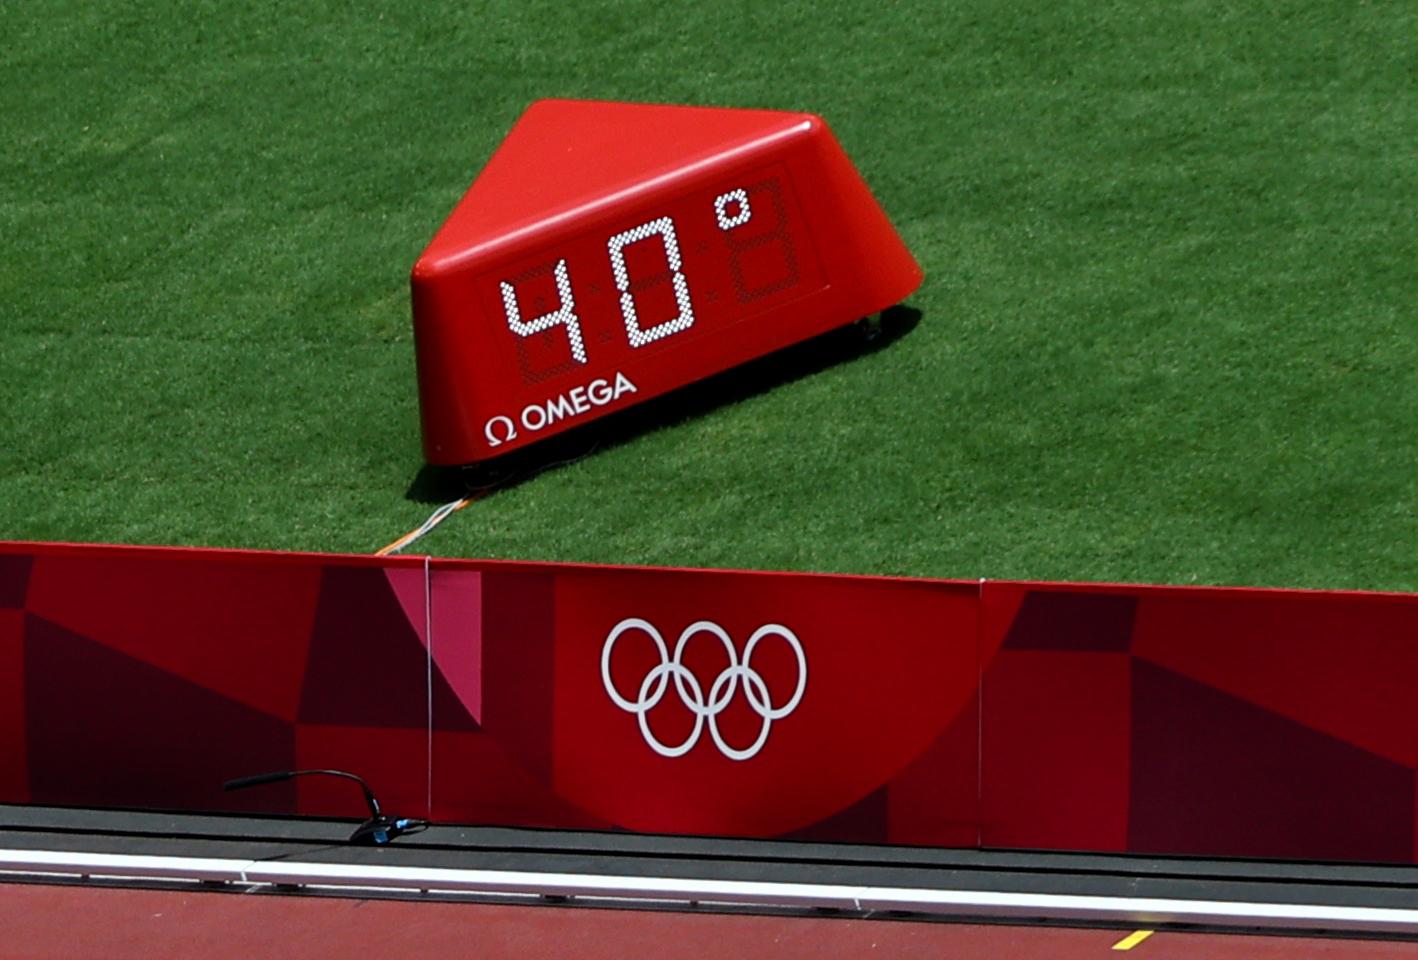 Tokyo 2020 Olympics - Athletics - Men's 400m - Round 1 - OLS - Olympic Stadium, Tokyo, Japan – August 1, 2021. Temperature in the Olympic Stadium during Heat 6 REUTERS/Fabrizio Bensch